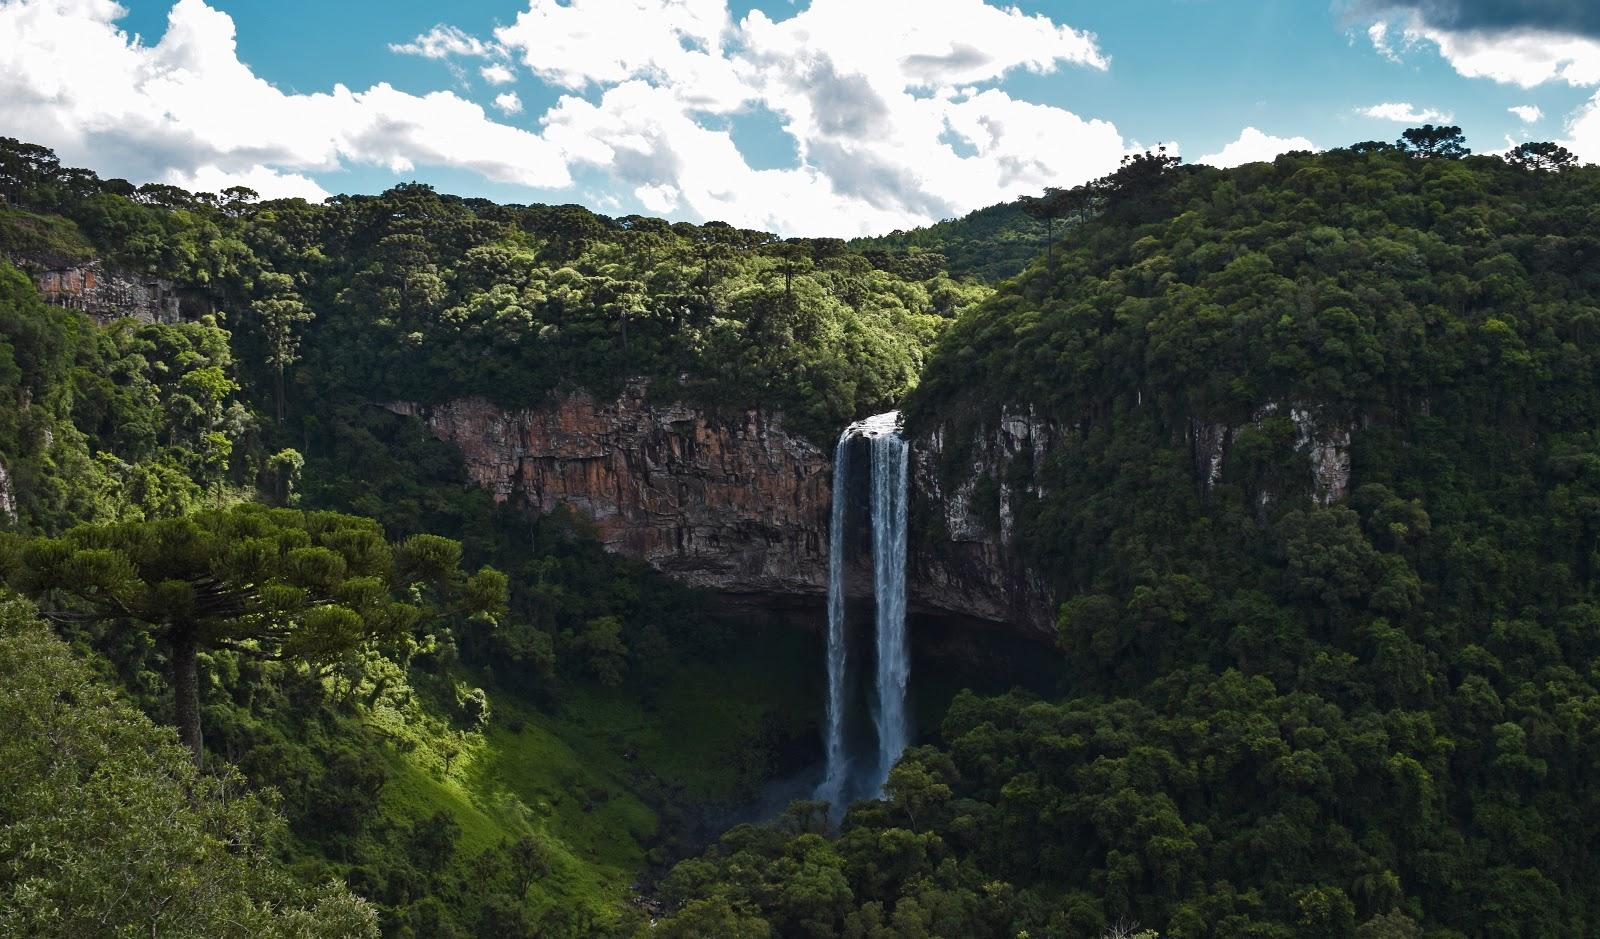 enchanted places, hyams beach, amazon rainforest, cabot trail